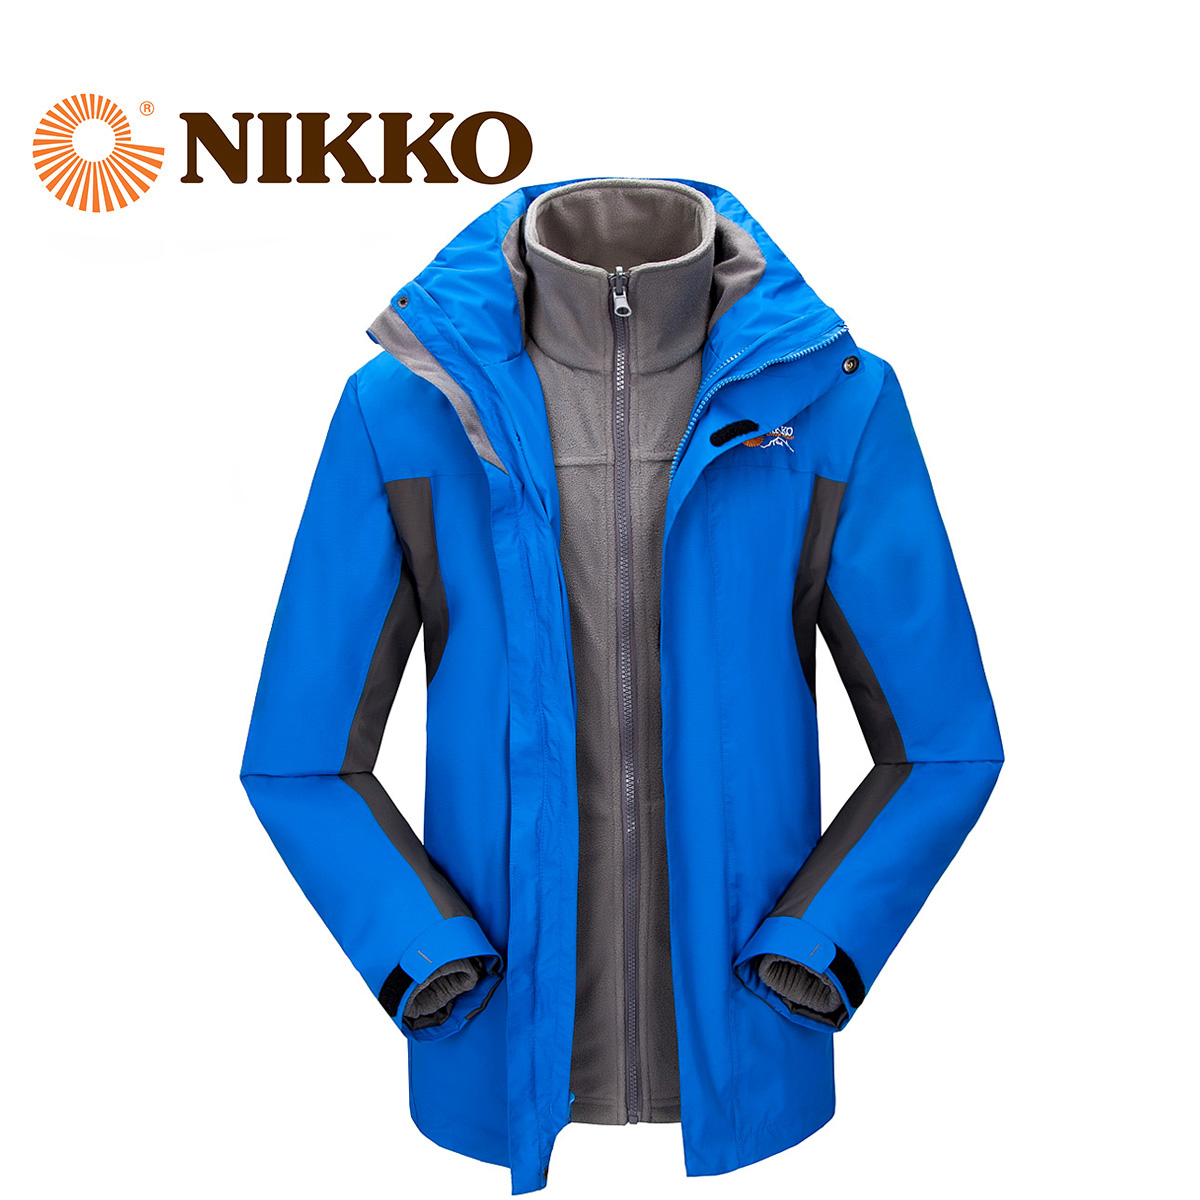 Nikko日高 戶外防水衝鋒衣兩件套透氣衝鋒衣男式秋冬外套NJB15001